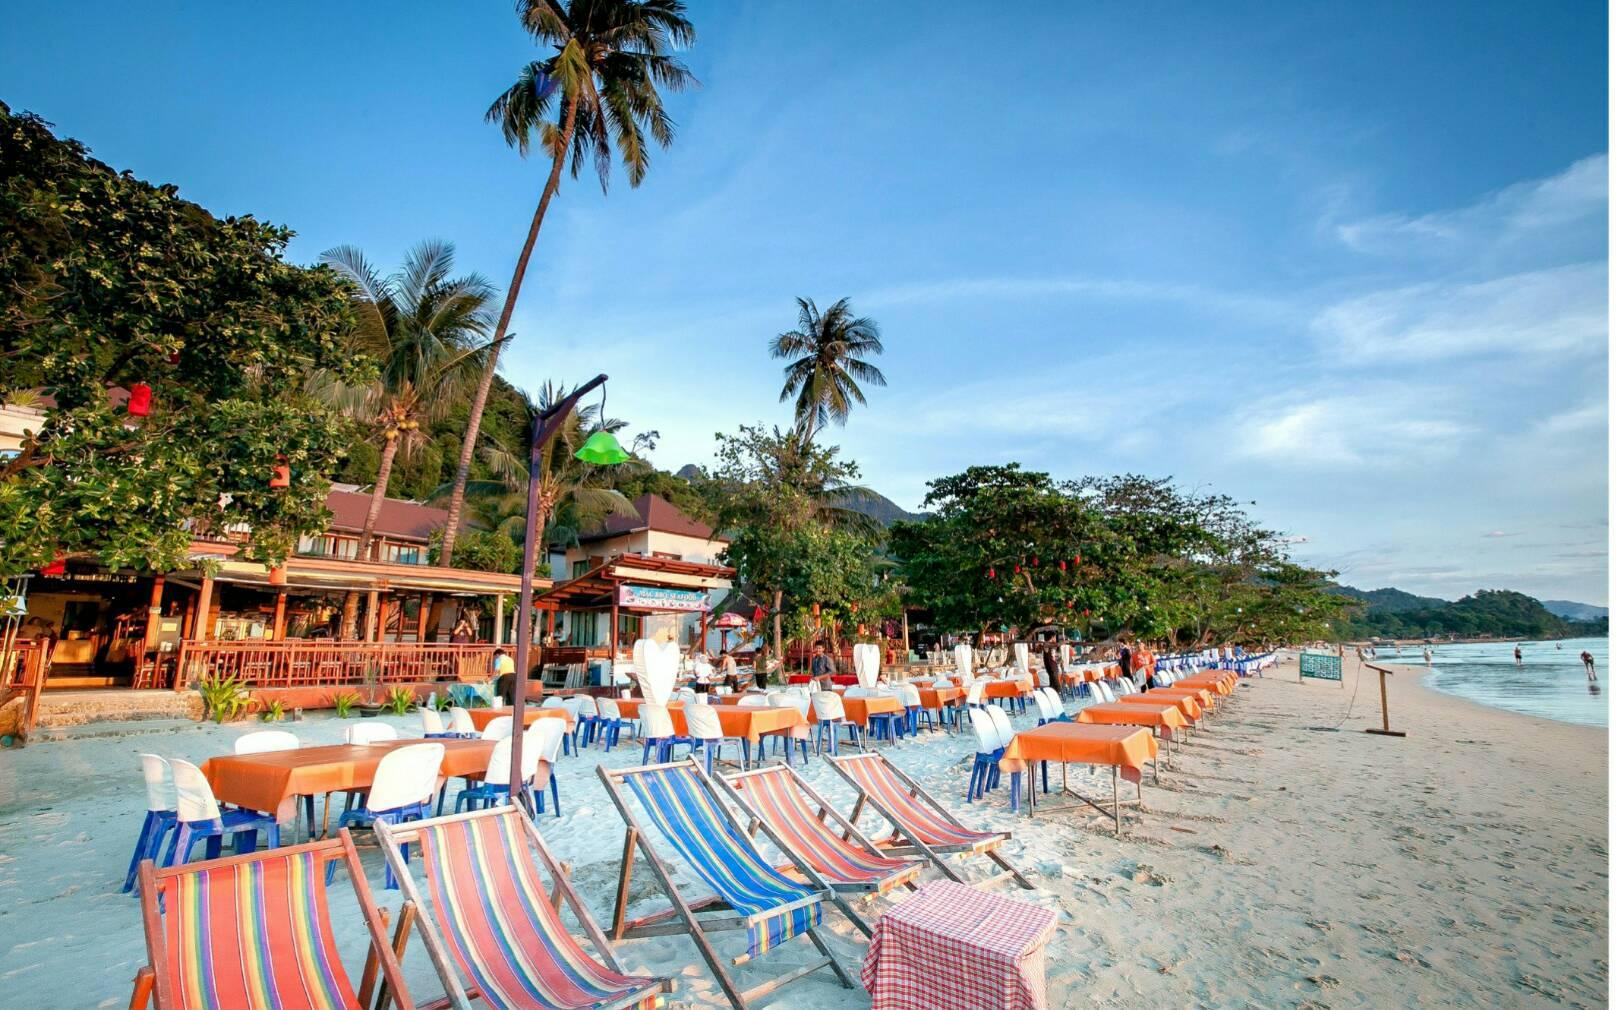 MAC Resort Hotel แม็ค รีสอร์ท